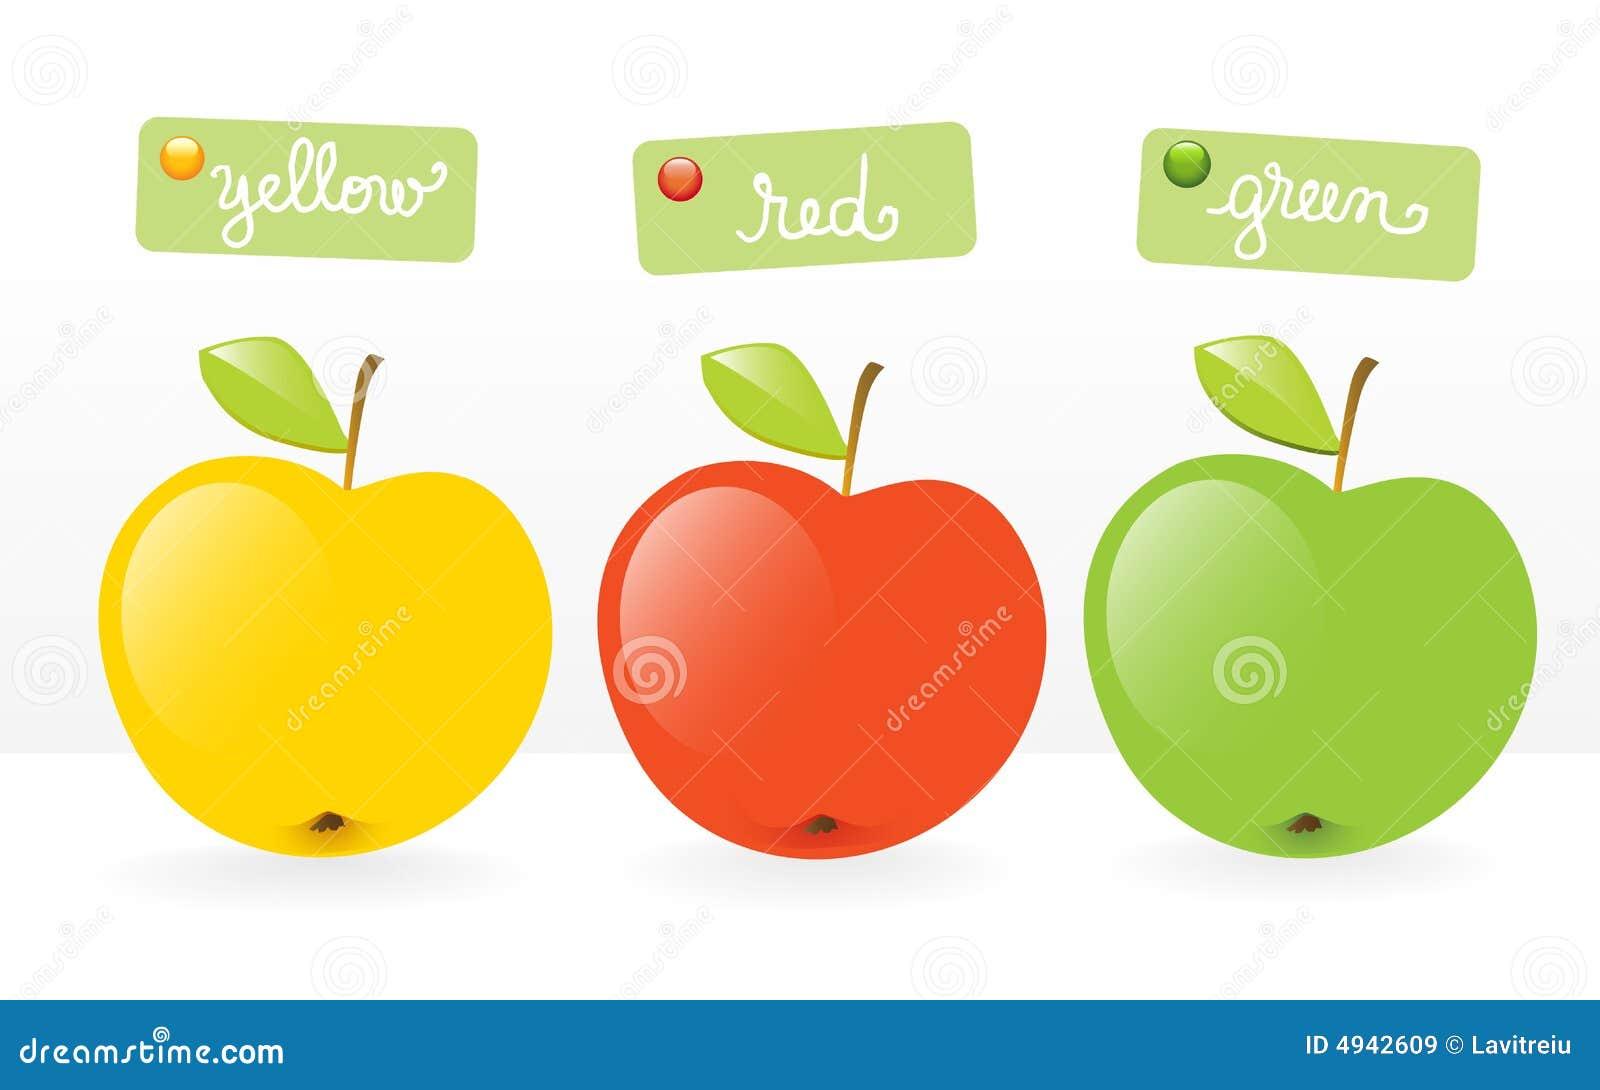 Fruits-three apples